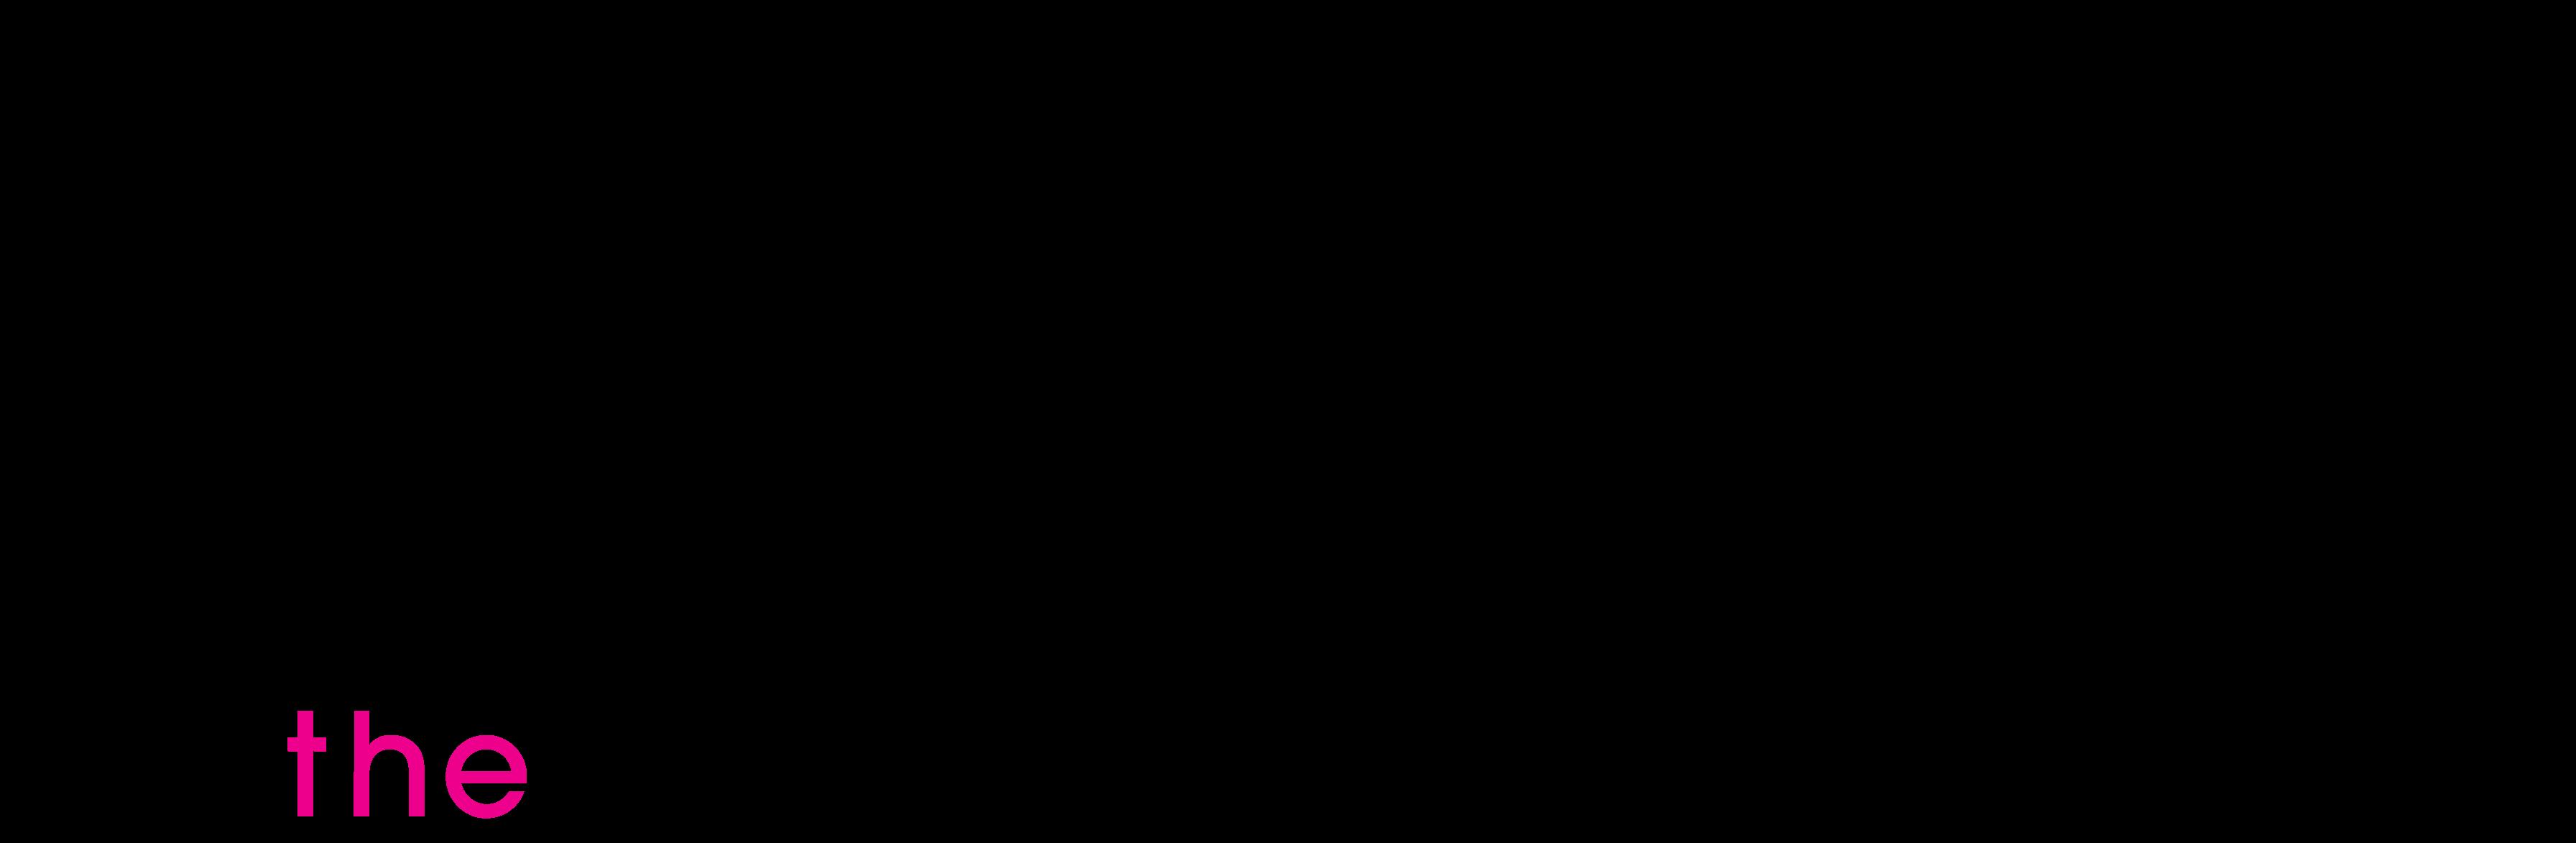 Avon products png logo 5606 Free Transparent PNG Logos